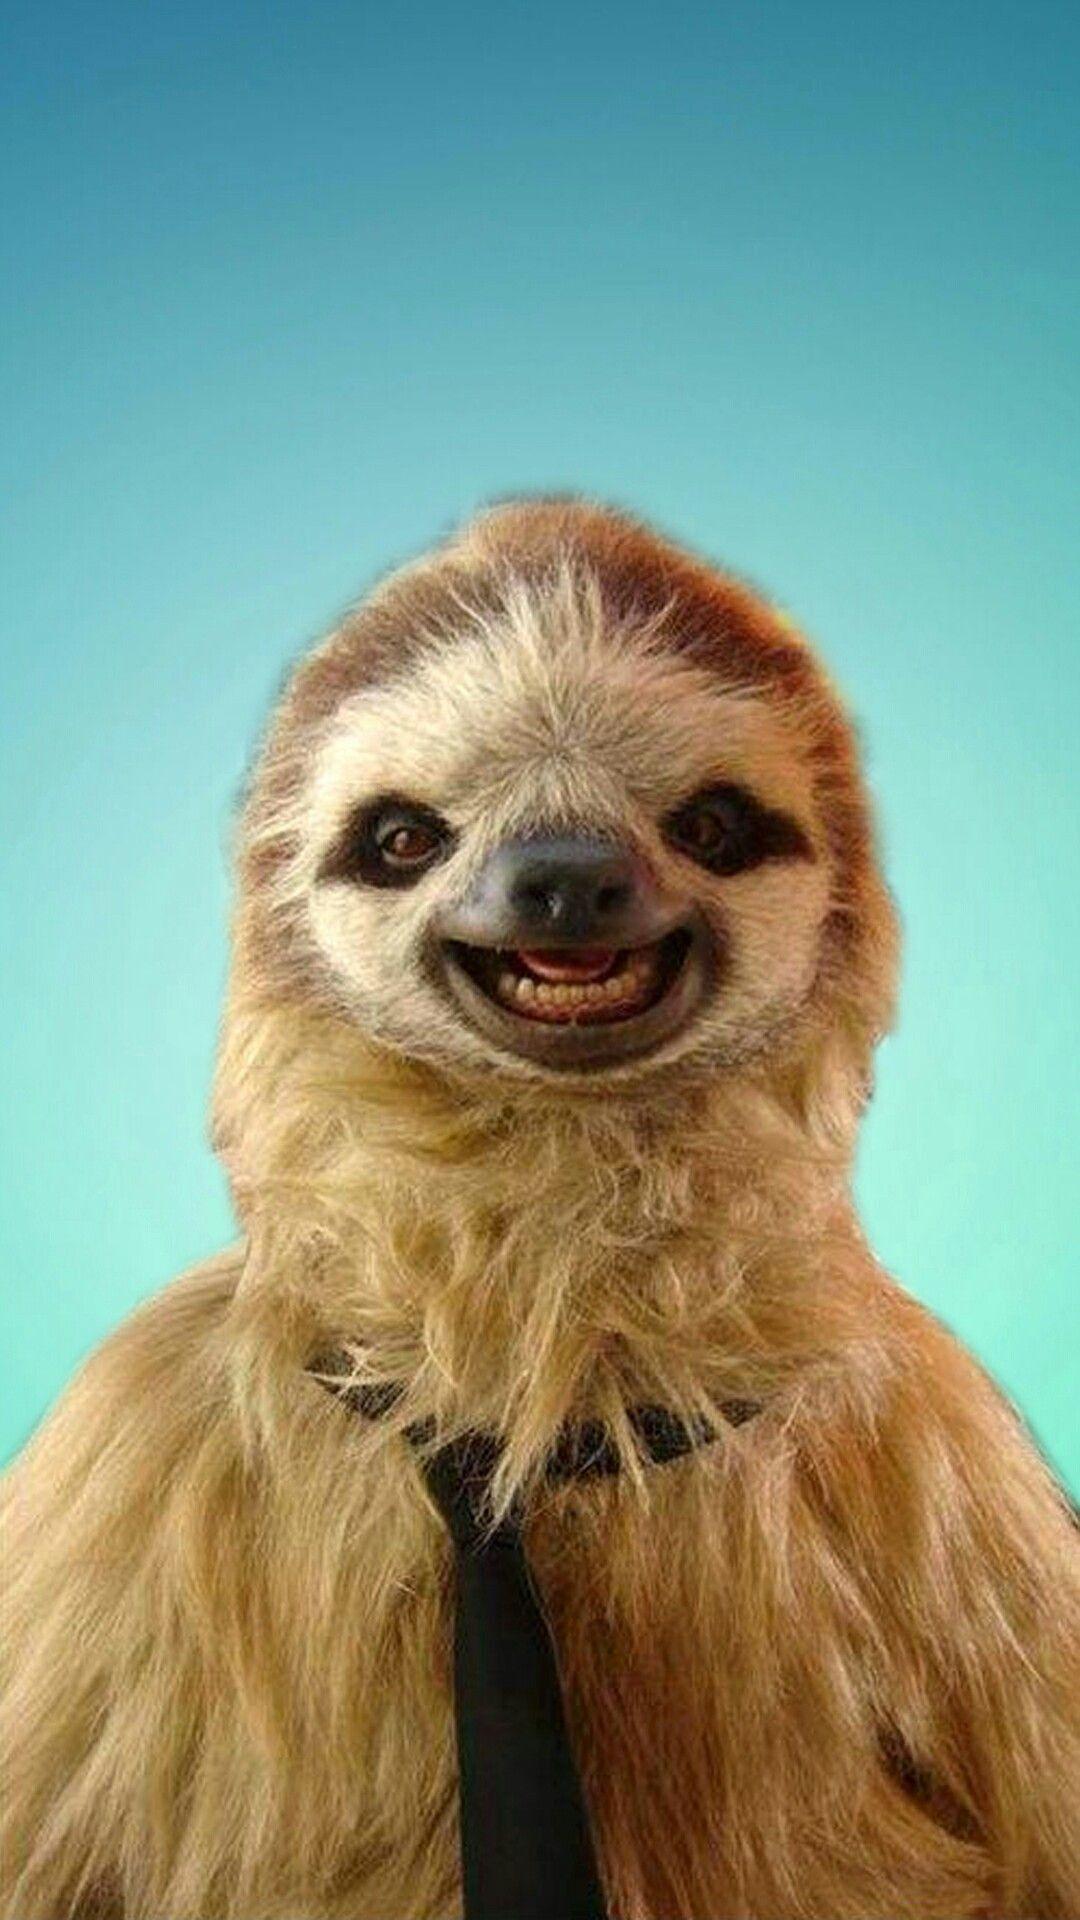 Best Of Sloth Wallpaper Phone Cute Sloth Cute Baby Sloths Cute Animals